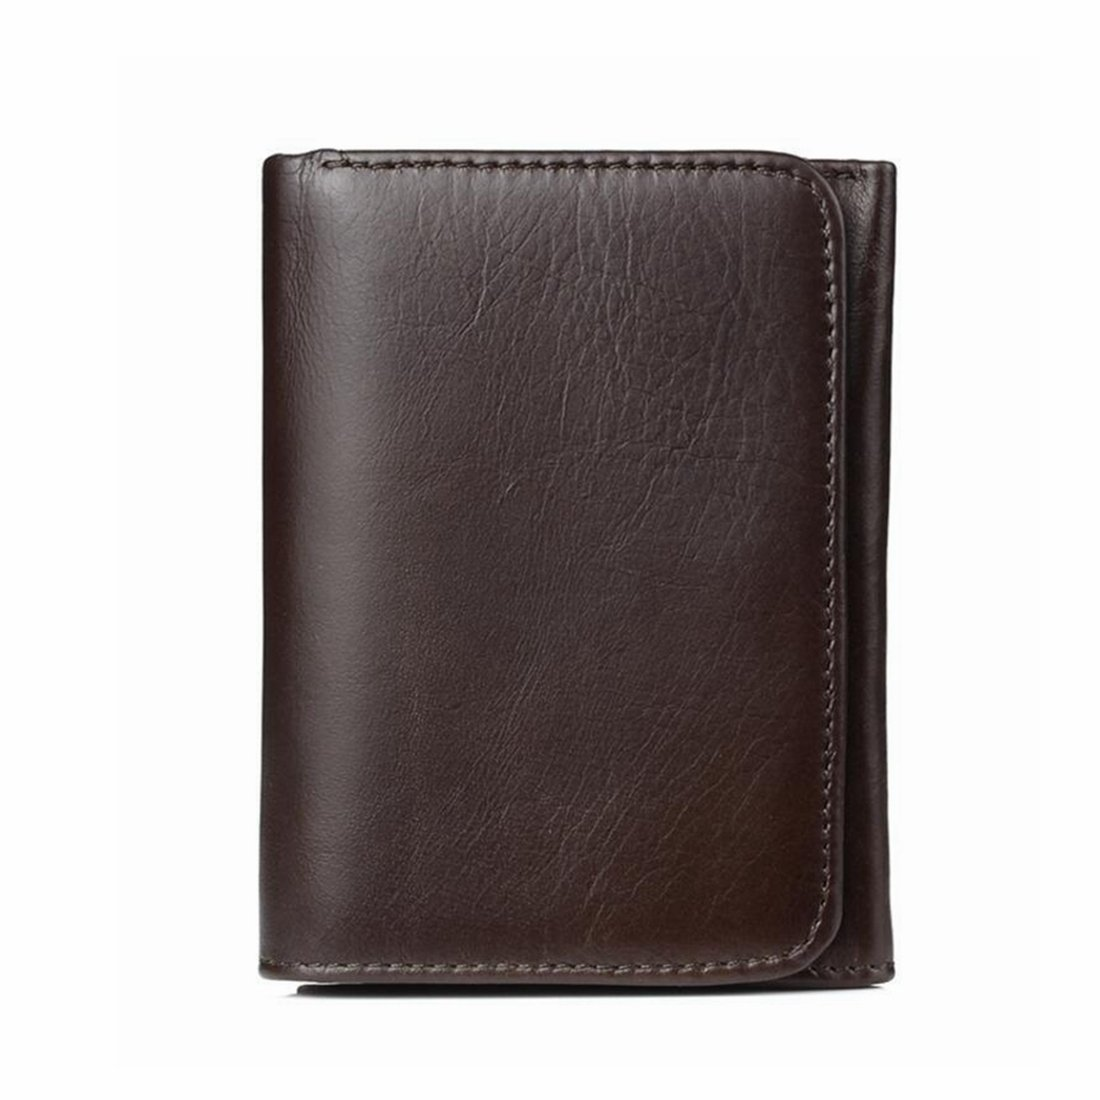 Color : Light Brown KRPENRIO Mens RFID Blocking Soft Leather Wallet Multi Card Holder Bifold Wallet Business Wallet